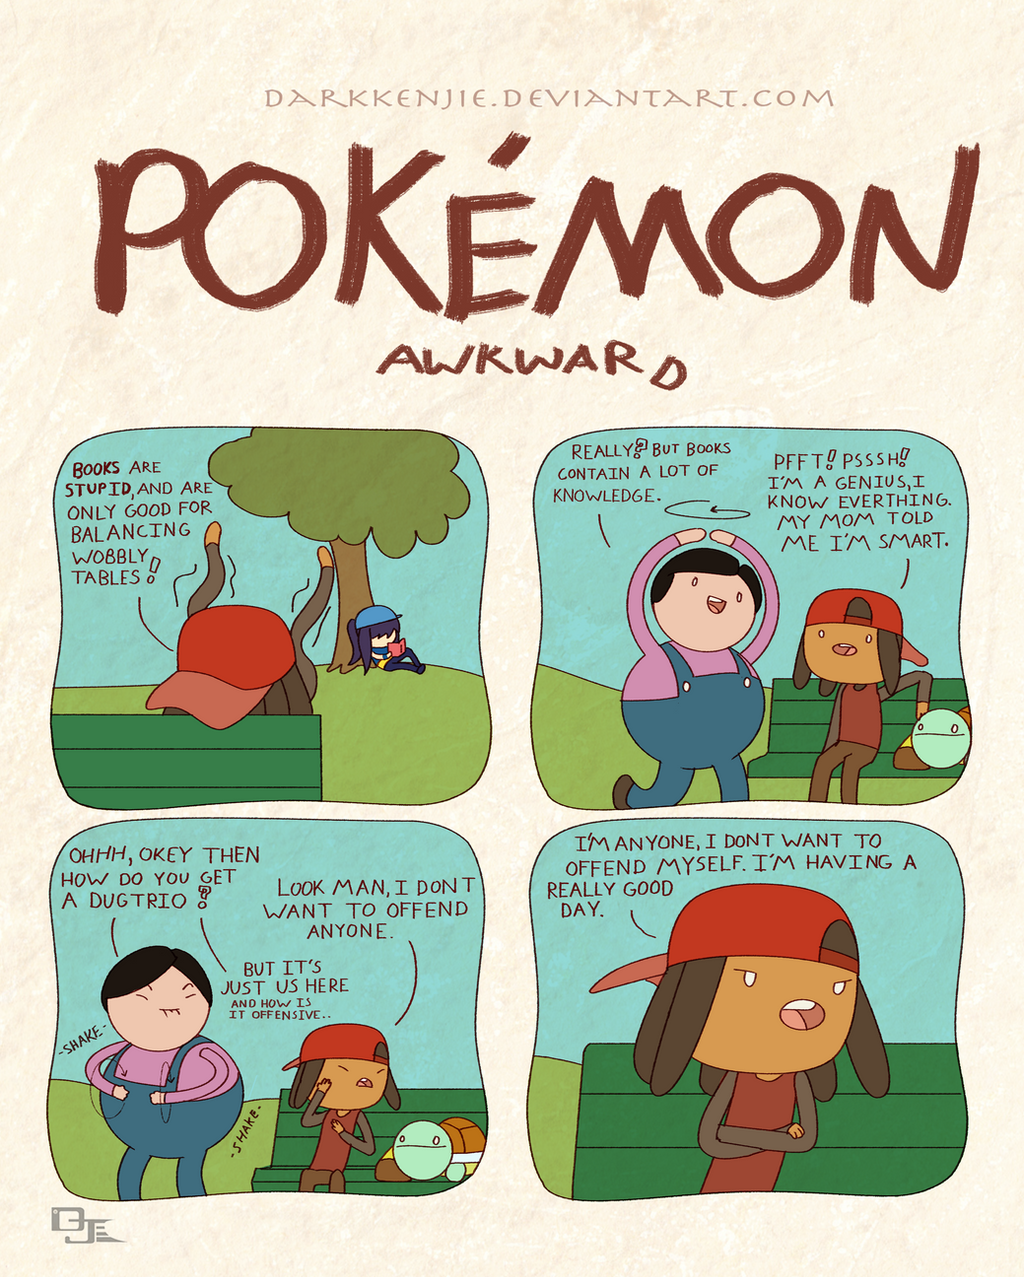 Pokemon Awkward: Dance Off by DarkKenjie